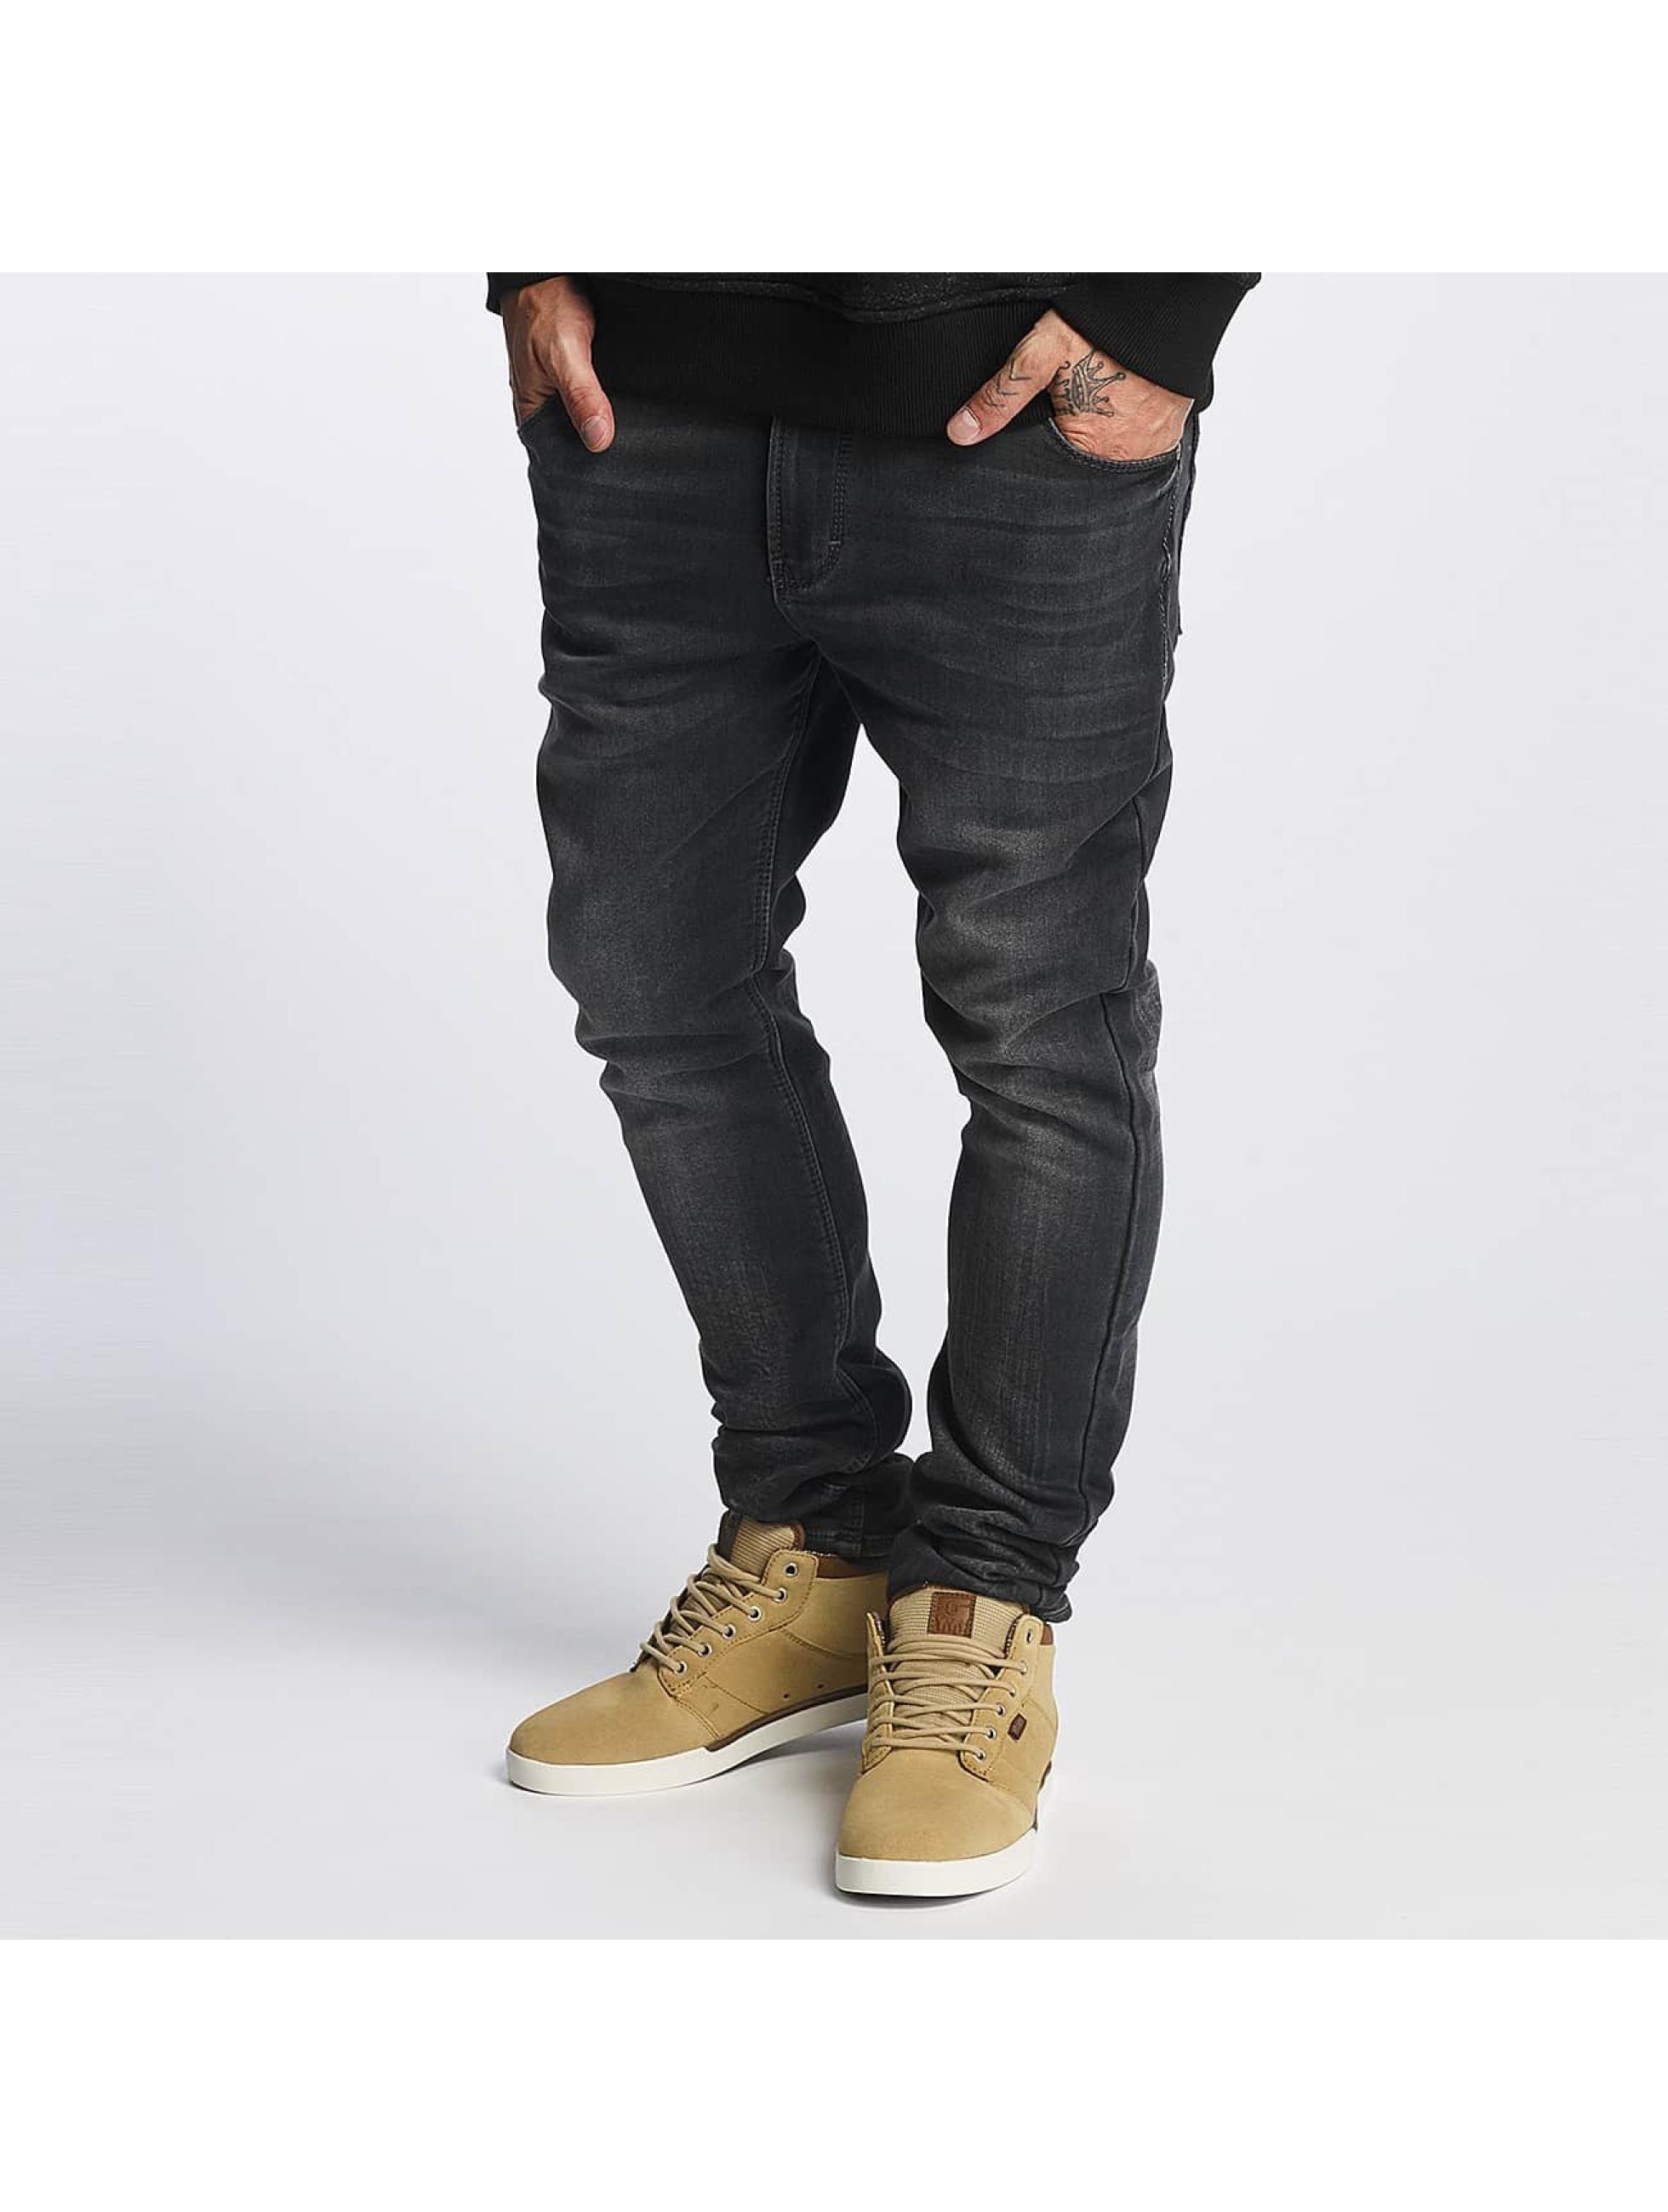 Reell Jeans Männer Jogginghose Jogger in schwarz